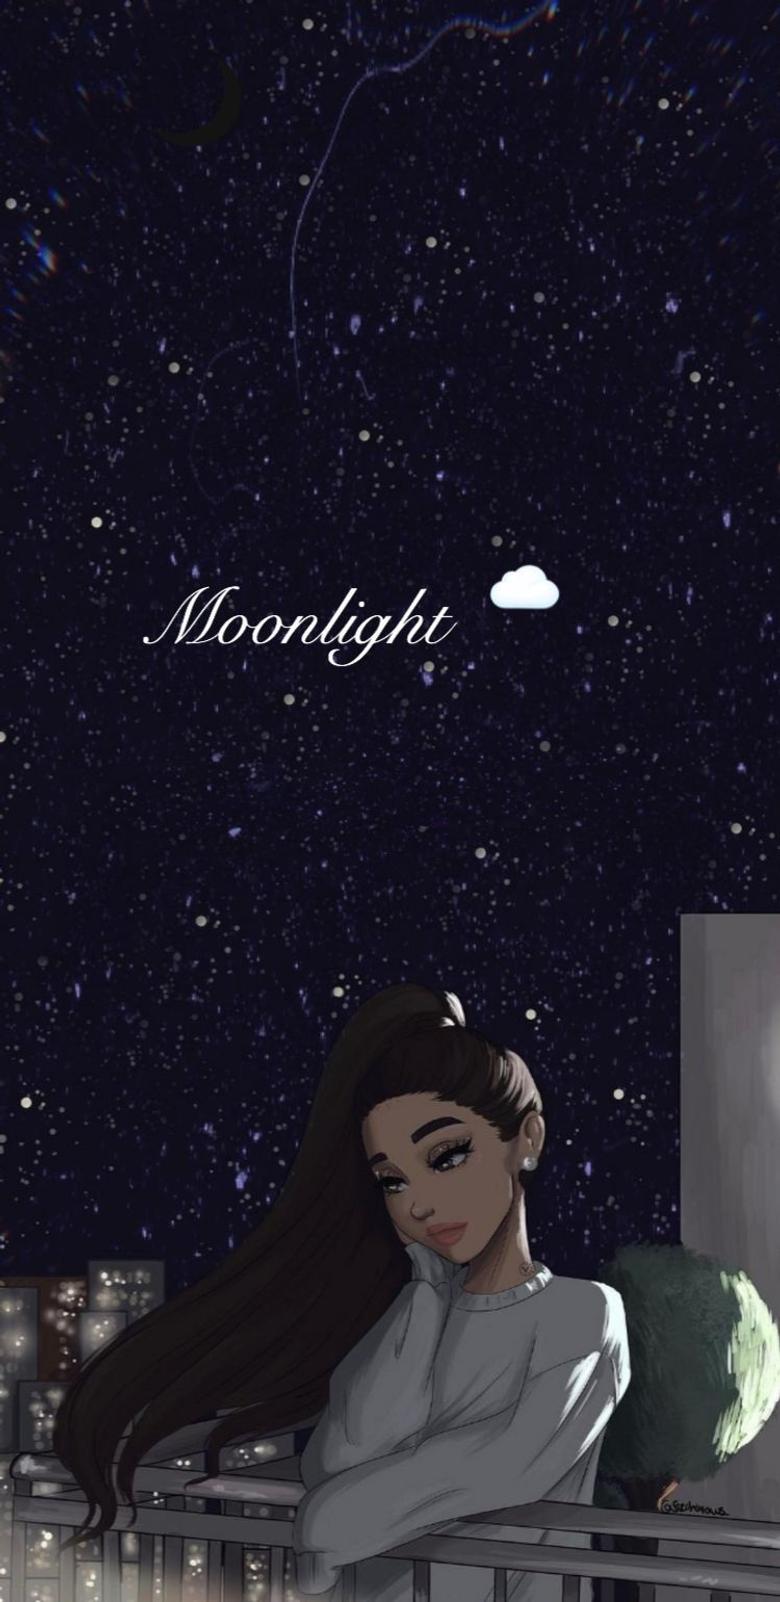 Ari Moonlight Wallpapers